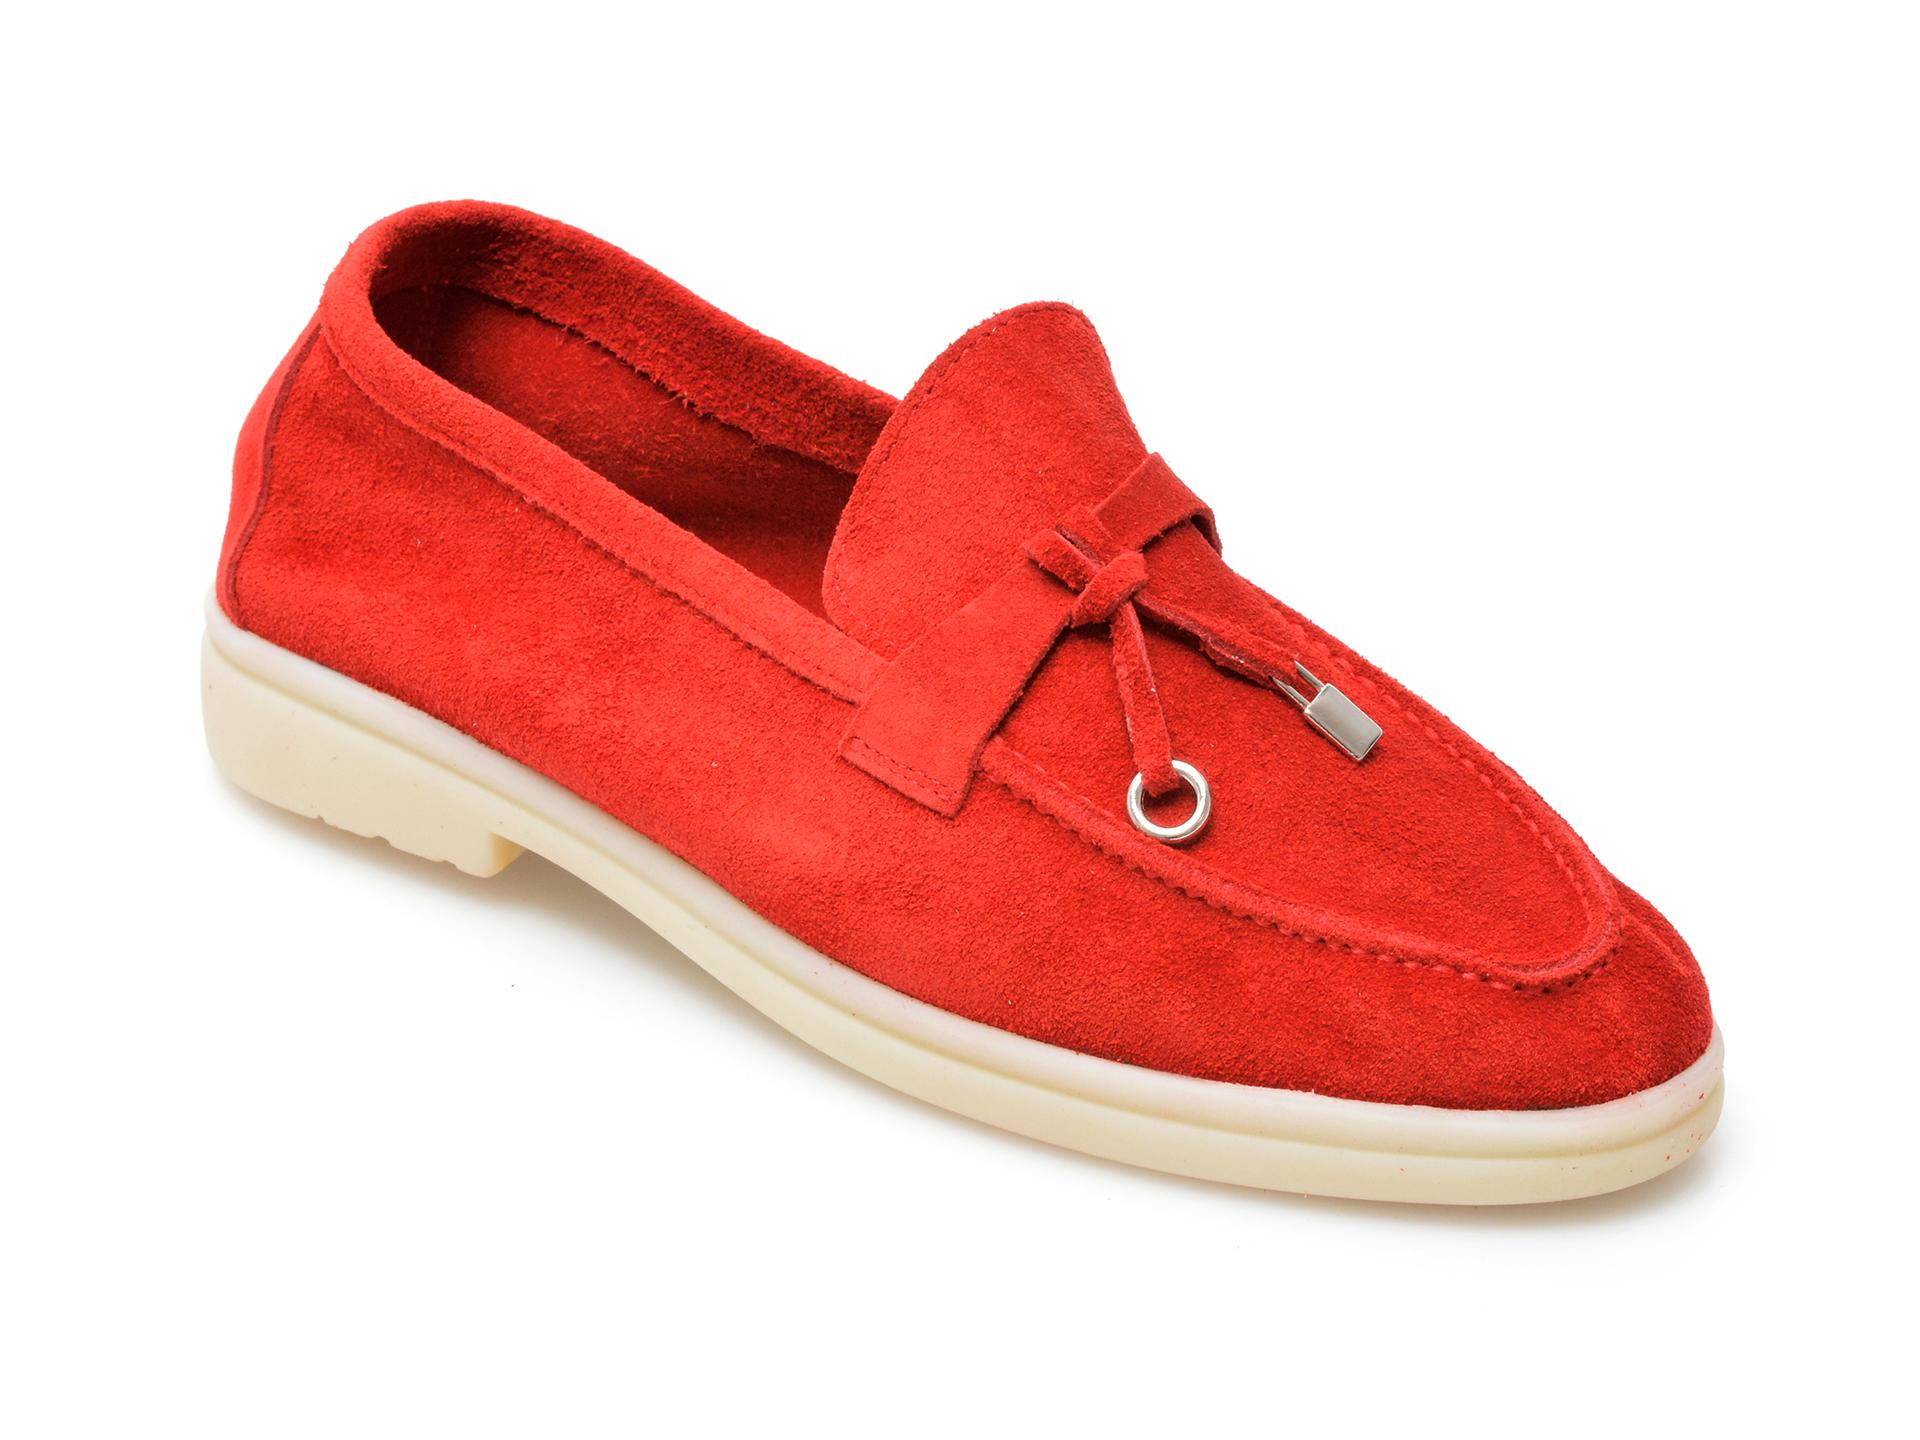 Pantofi IMAGE rosii, 205100, din piele intoarsa imagine otter.ro 2021